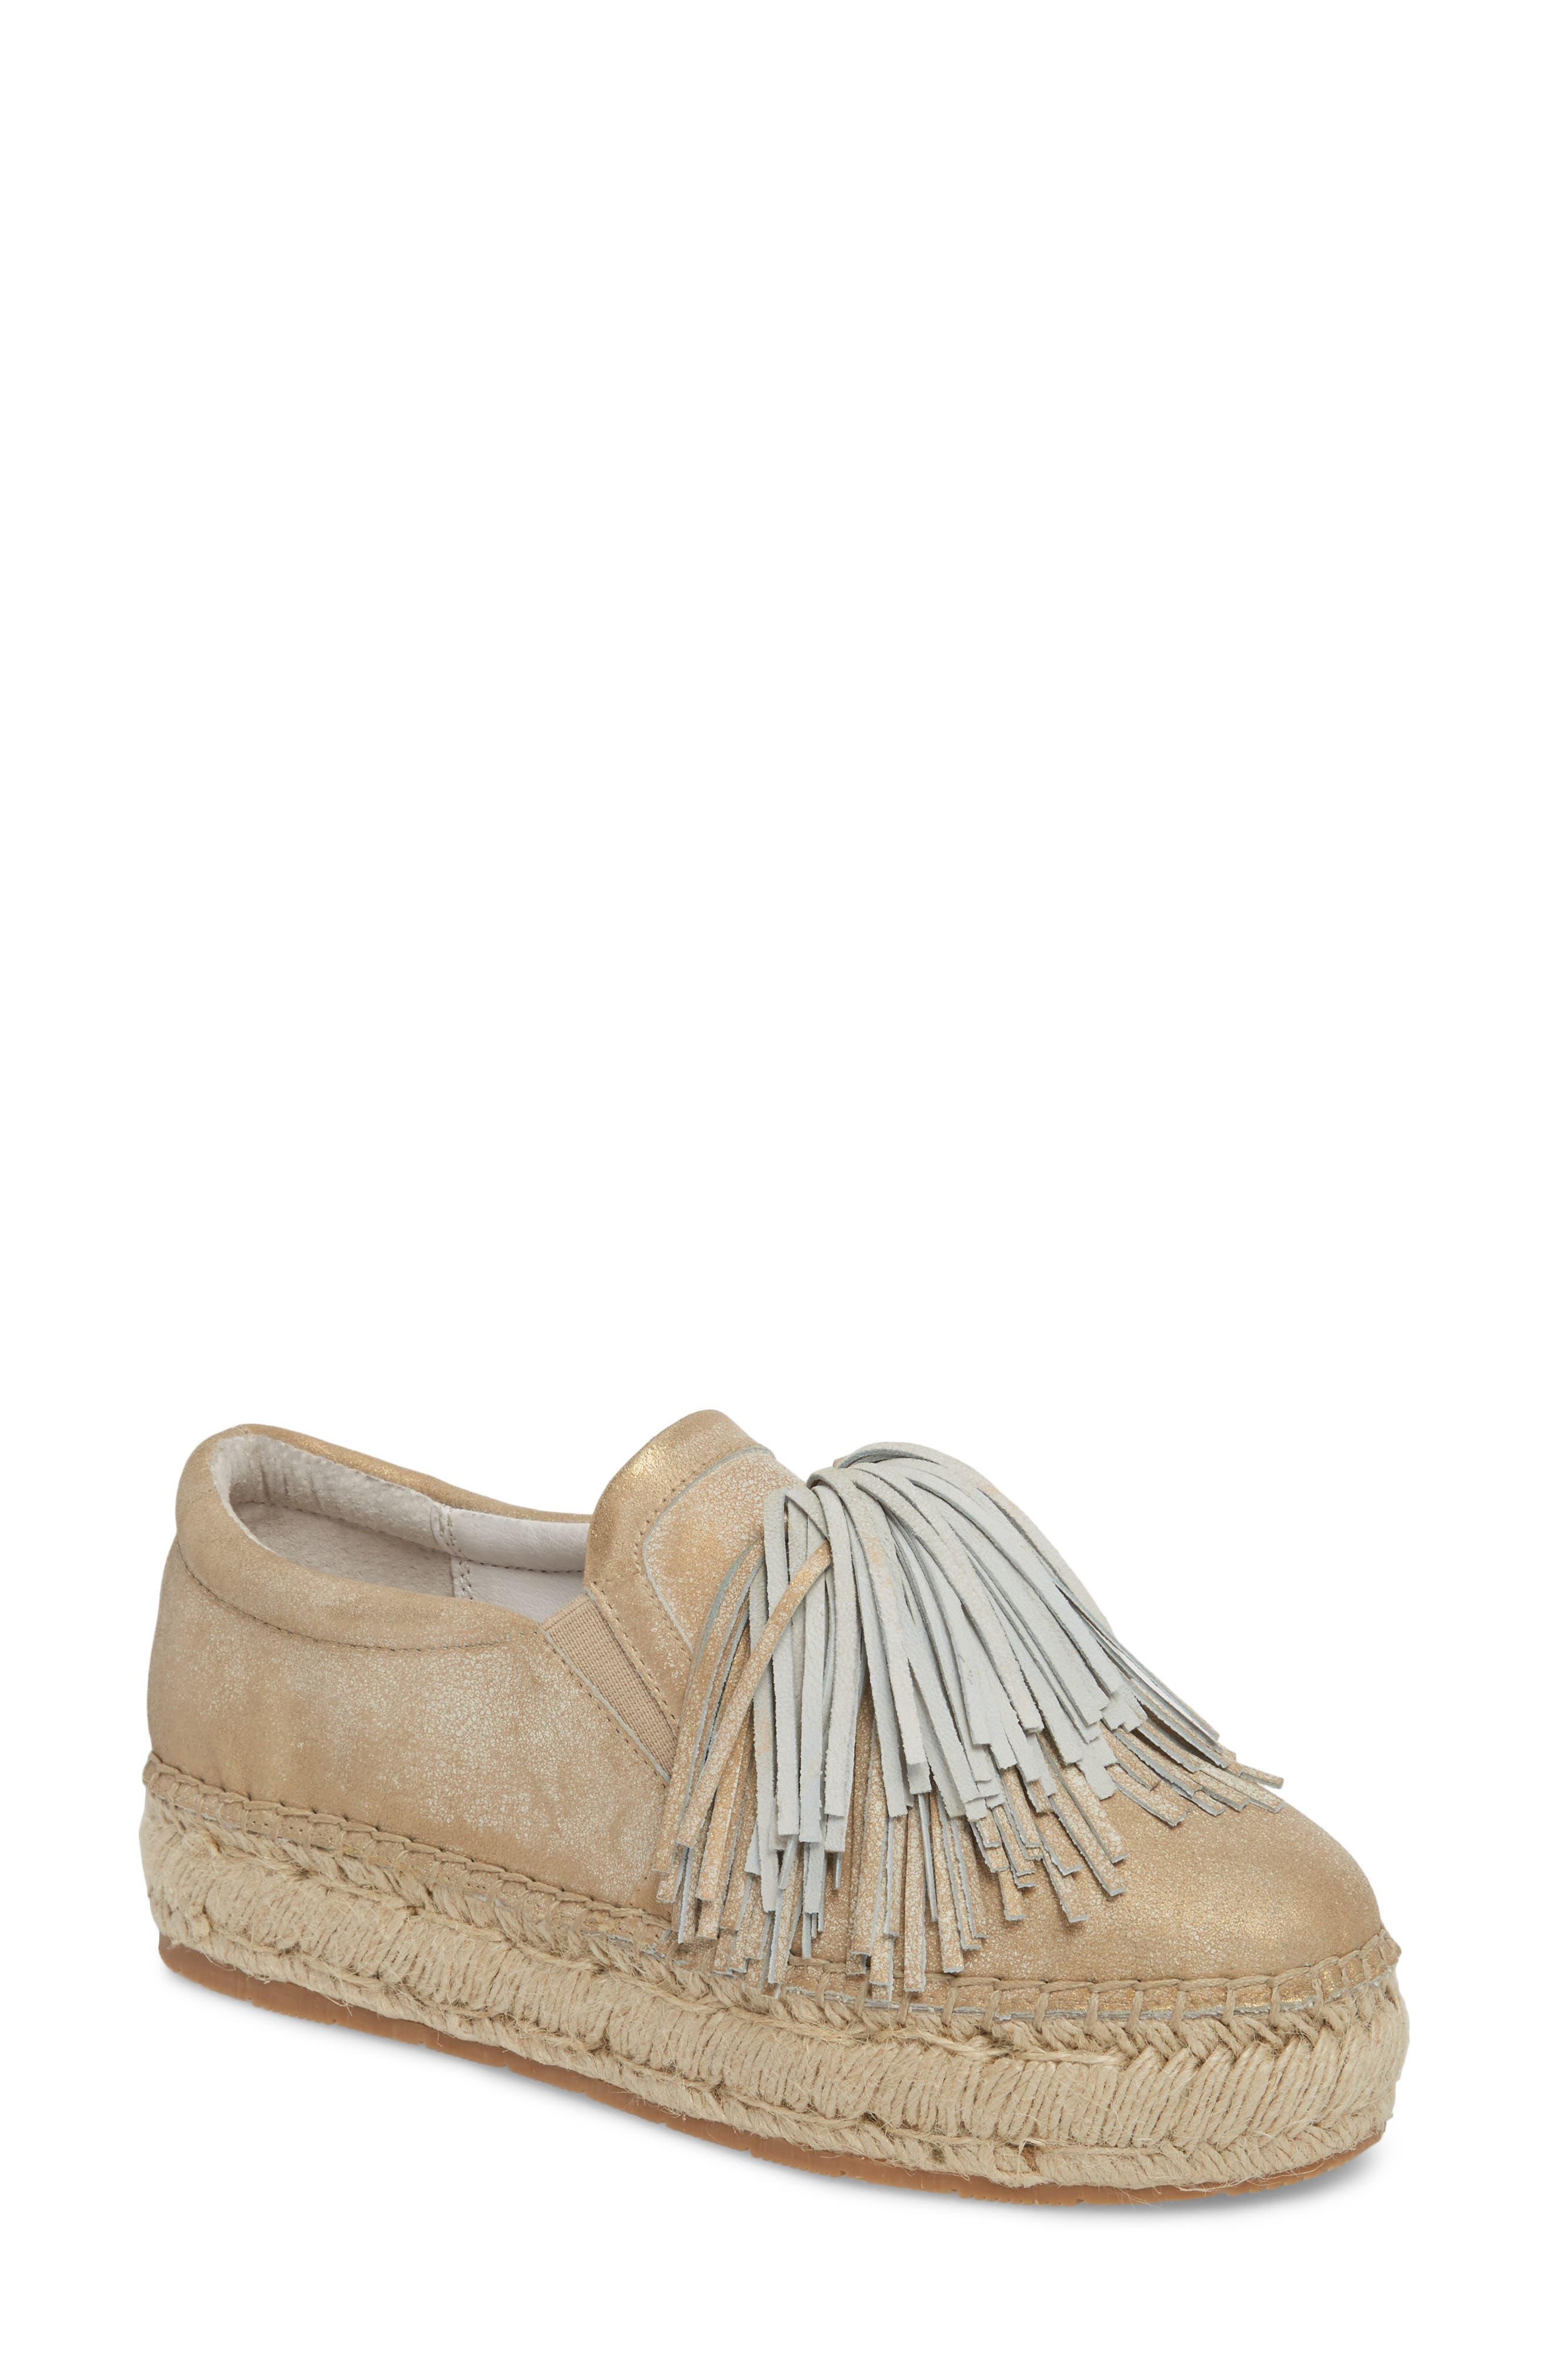 Raoul Espadrille Sneaker,                         Main,                         color, Bronze Leather